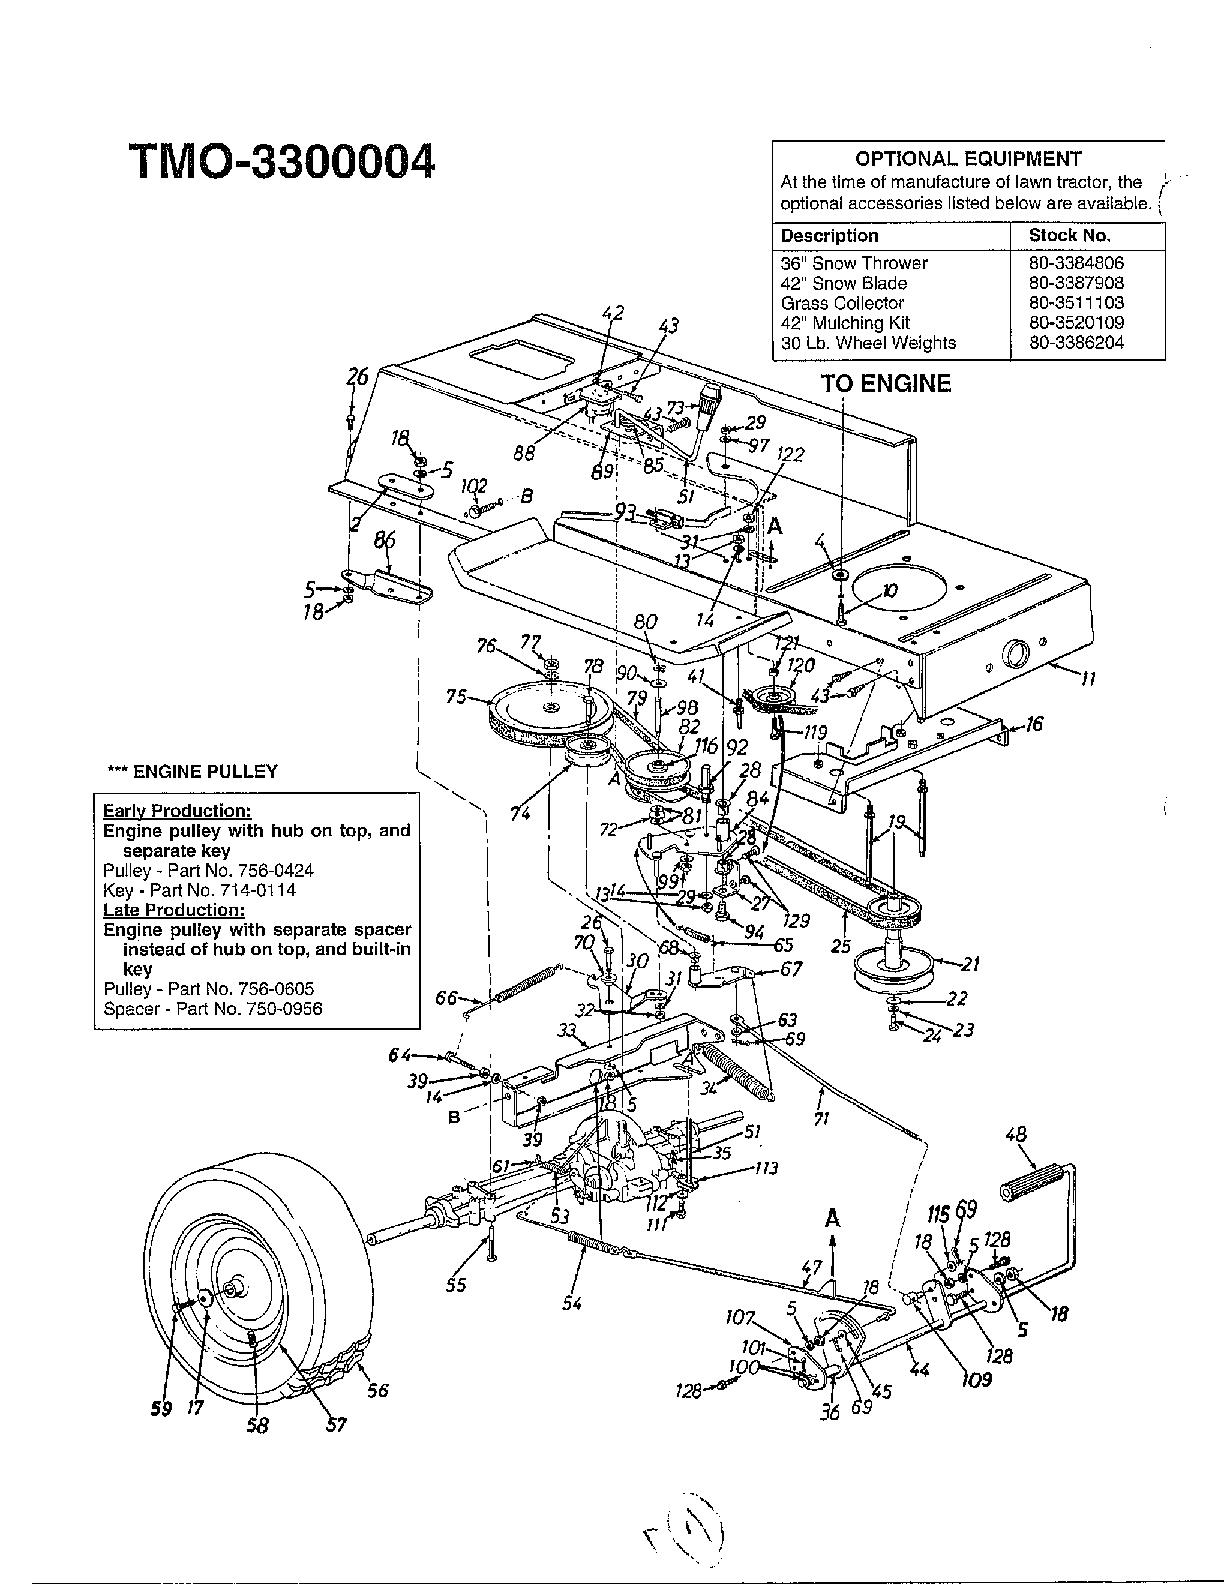 Mtd model 3300004 lawn, tractor genuine parts